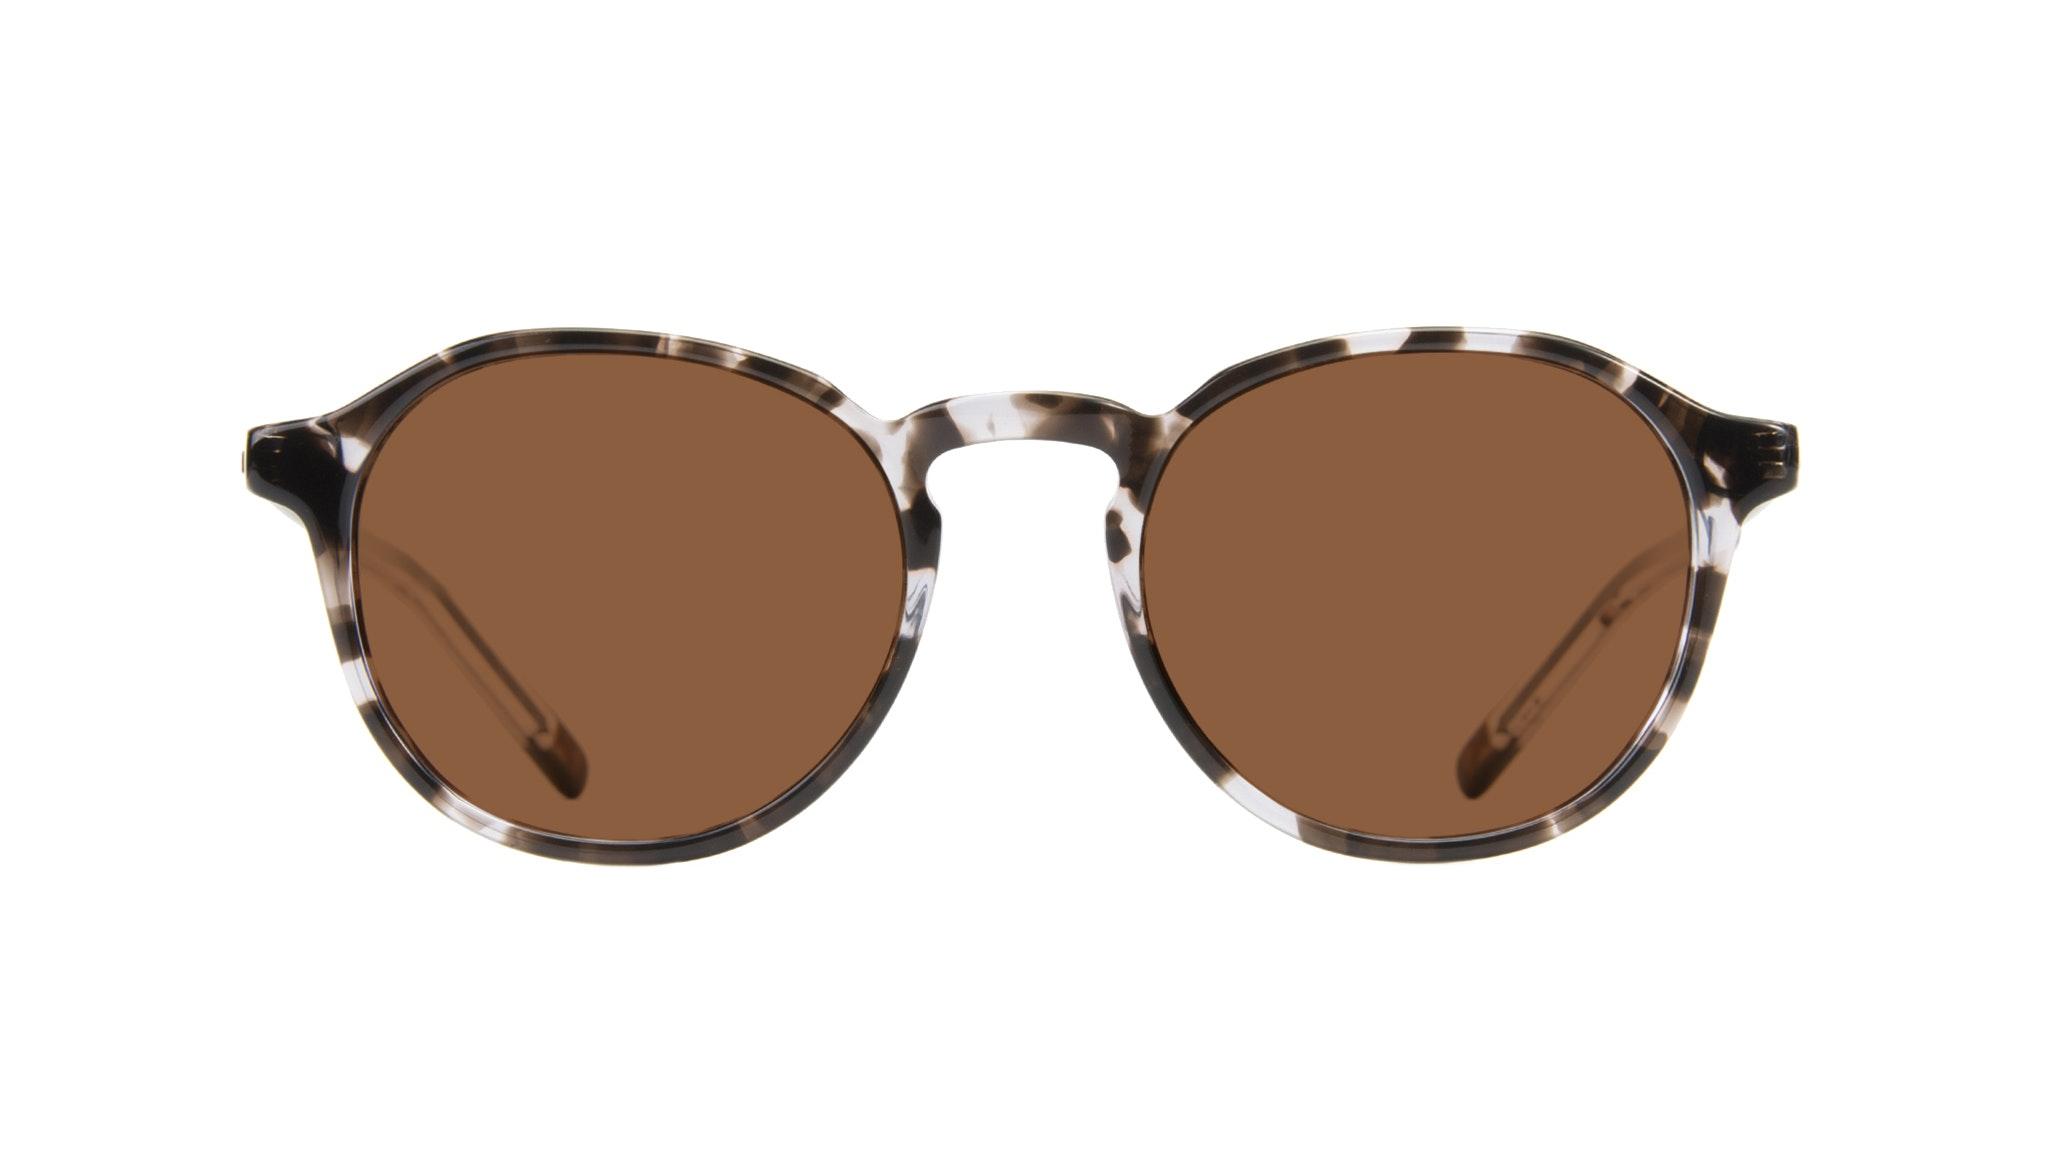 Affordable Fashion Glasses Round Sunglasses Men Prime Mud Tort Front